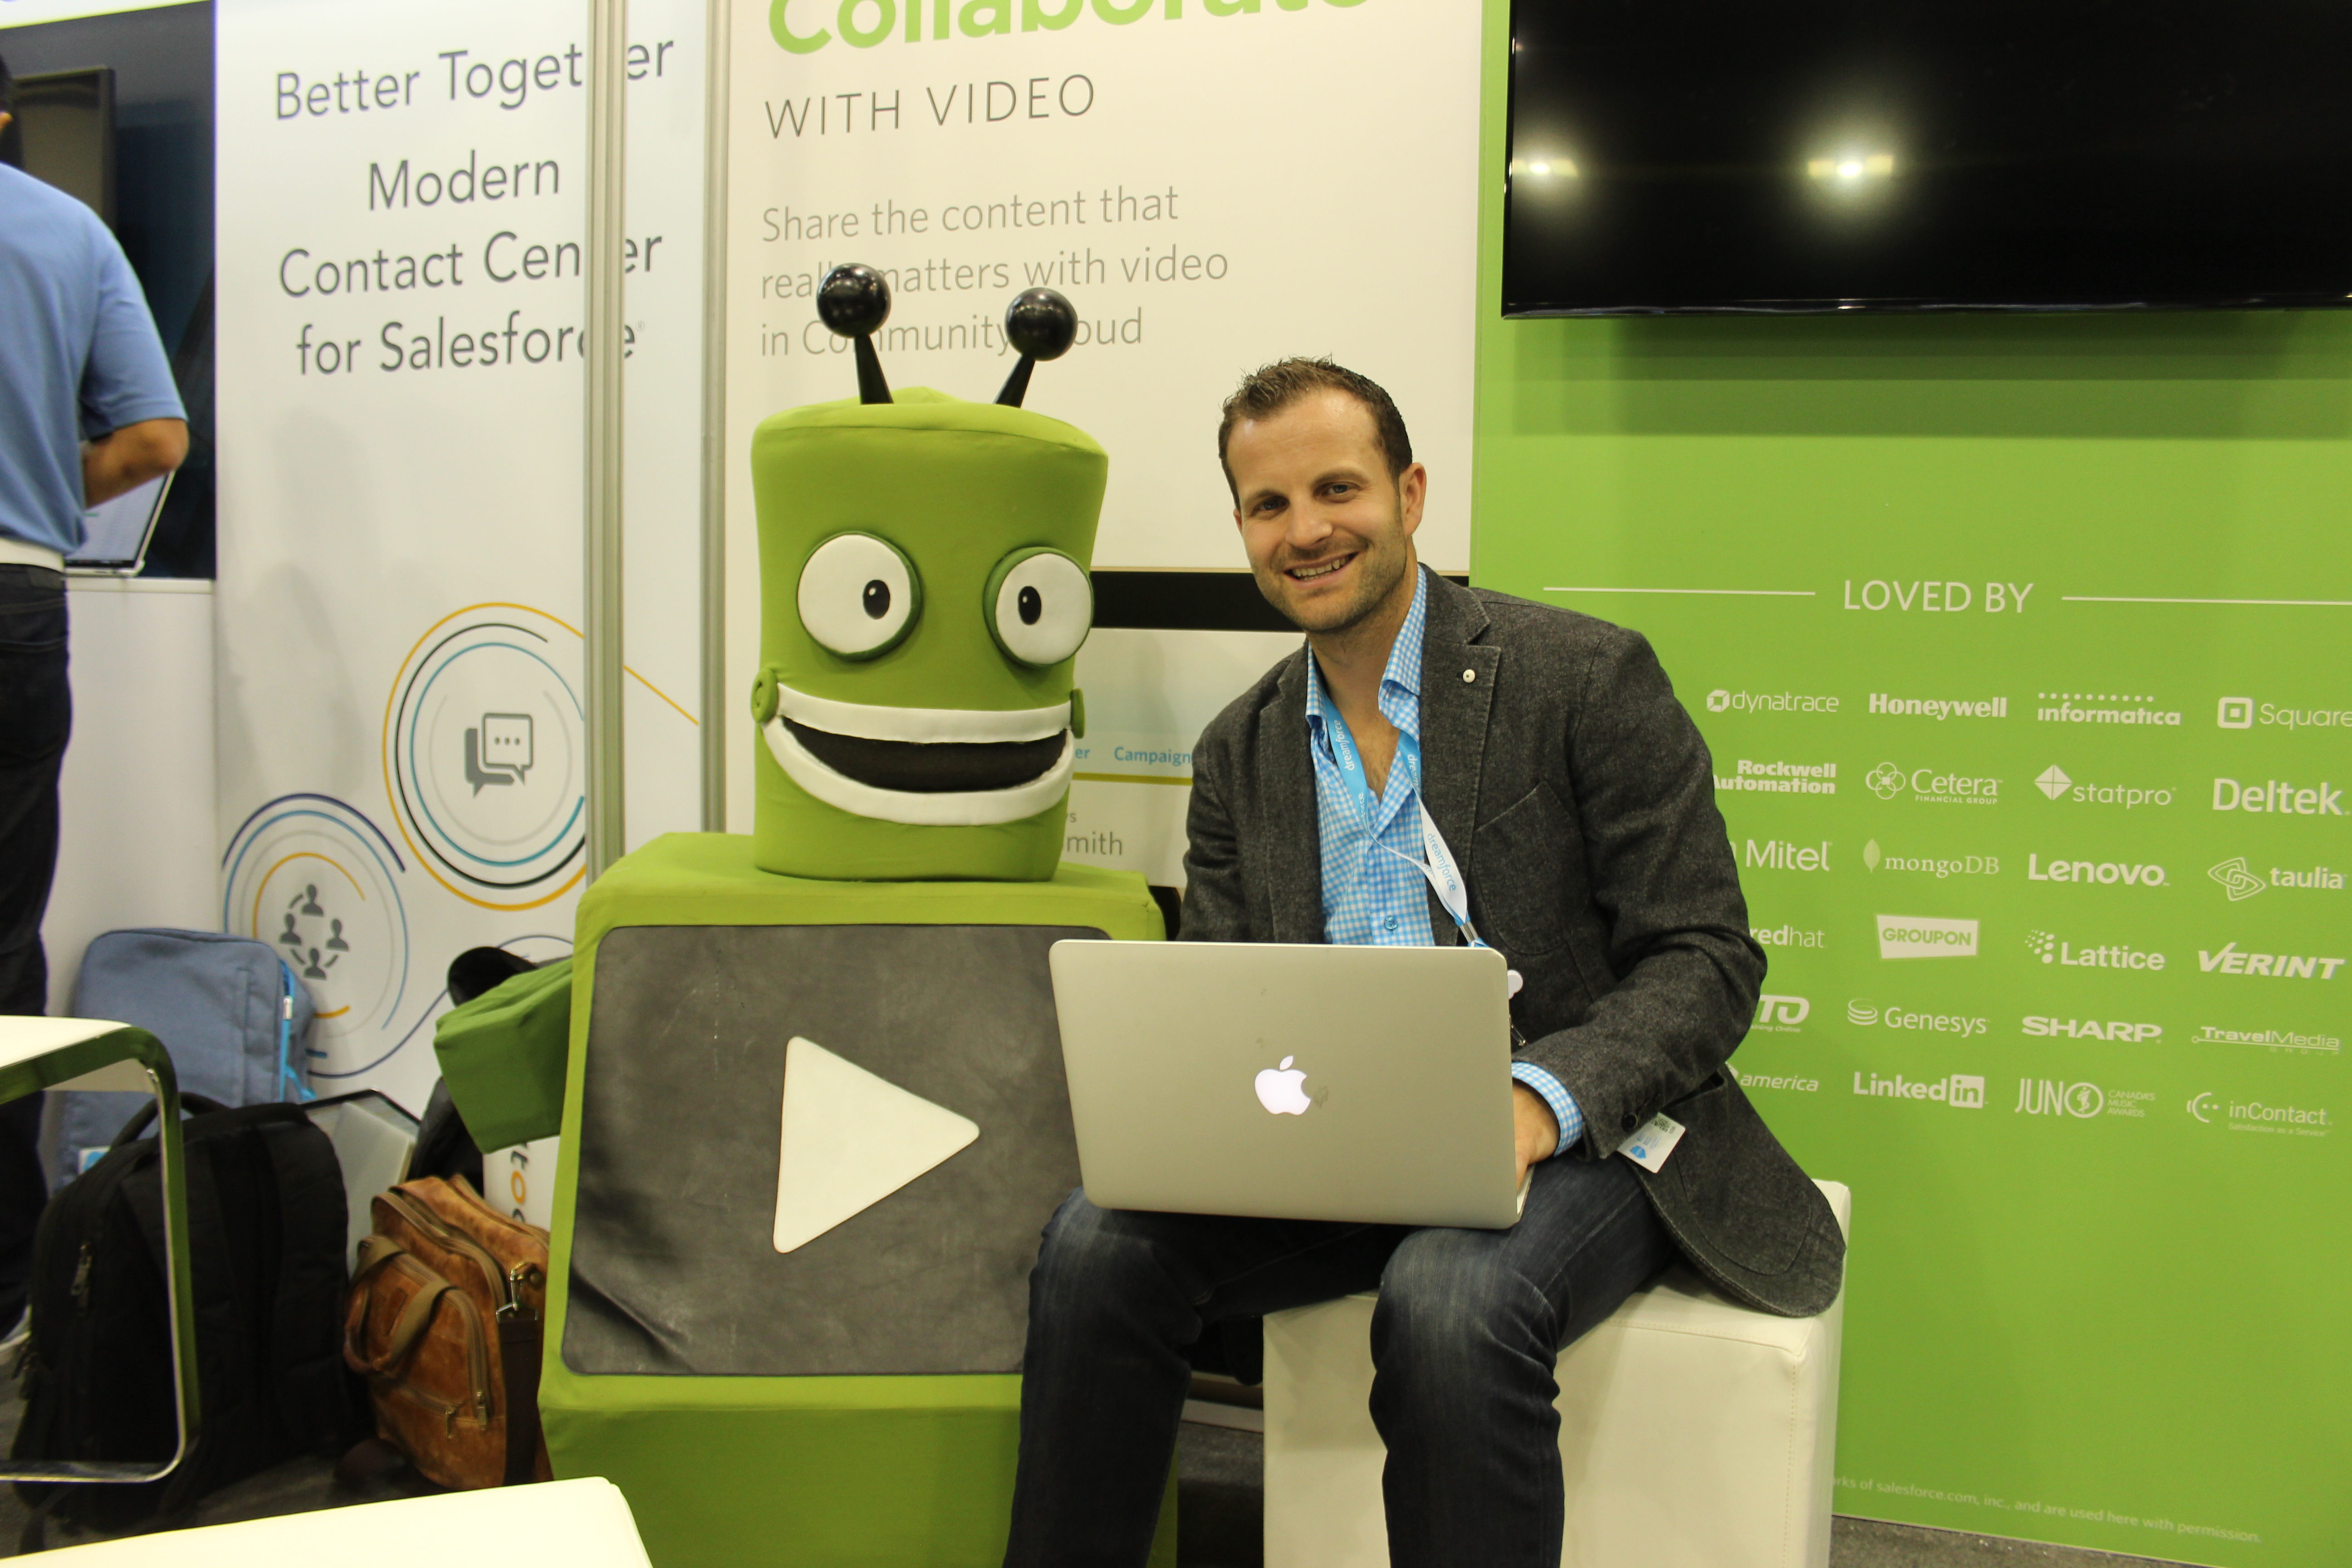 Jeff Gadway, director of product martketing at Vidyard, with mascot Vbot at Dreamforce.